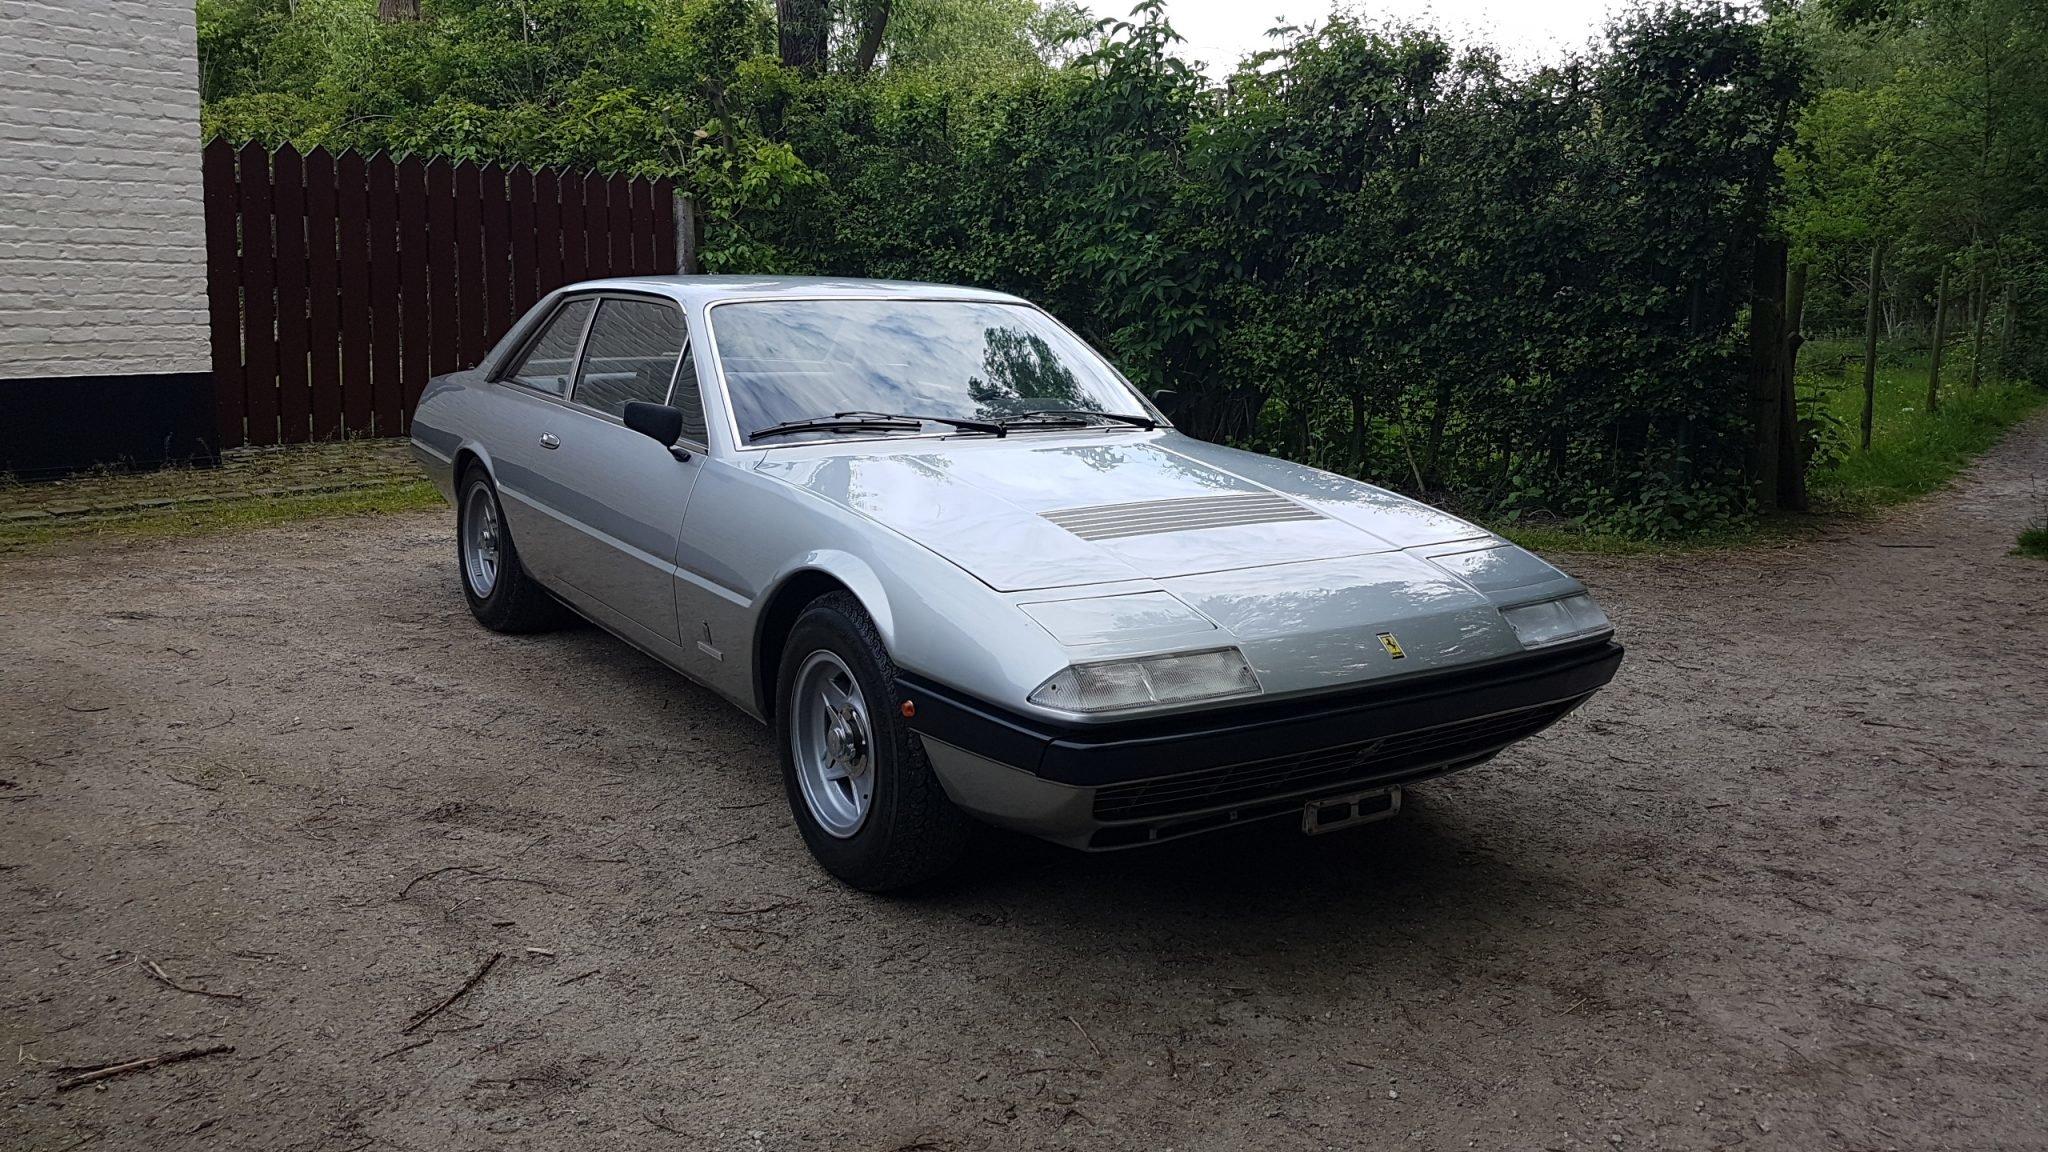 1975 Ferrari 365 GT4 2+2 For Sale (picture 3 of 6)